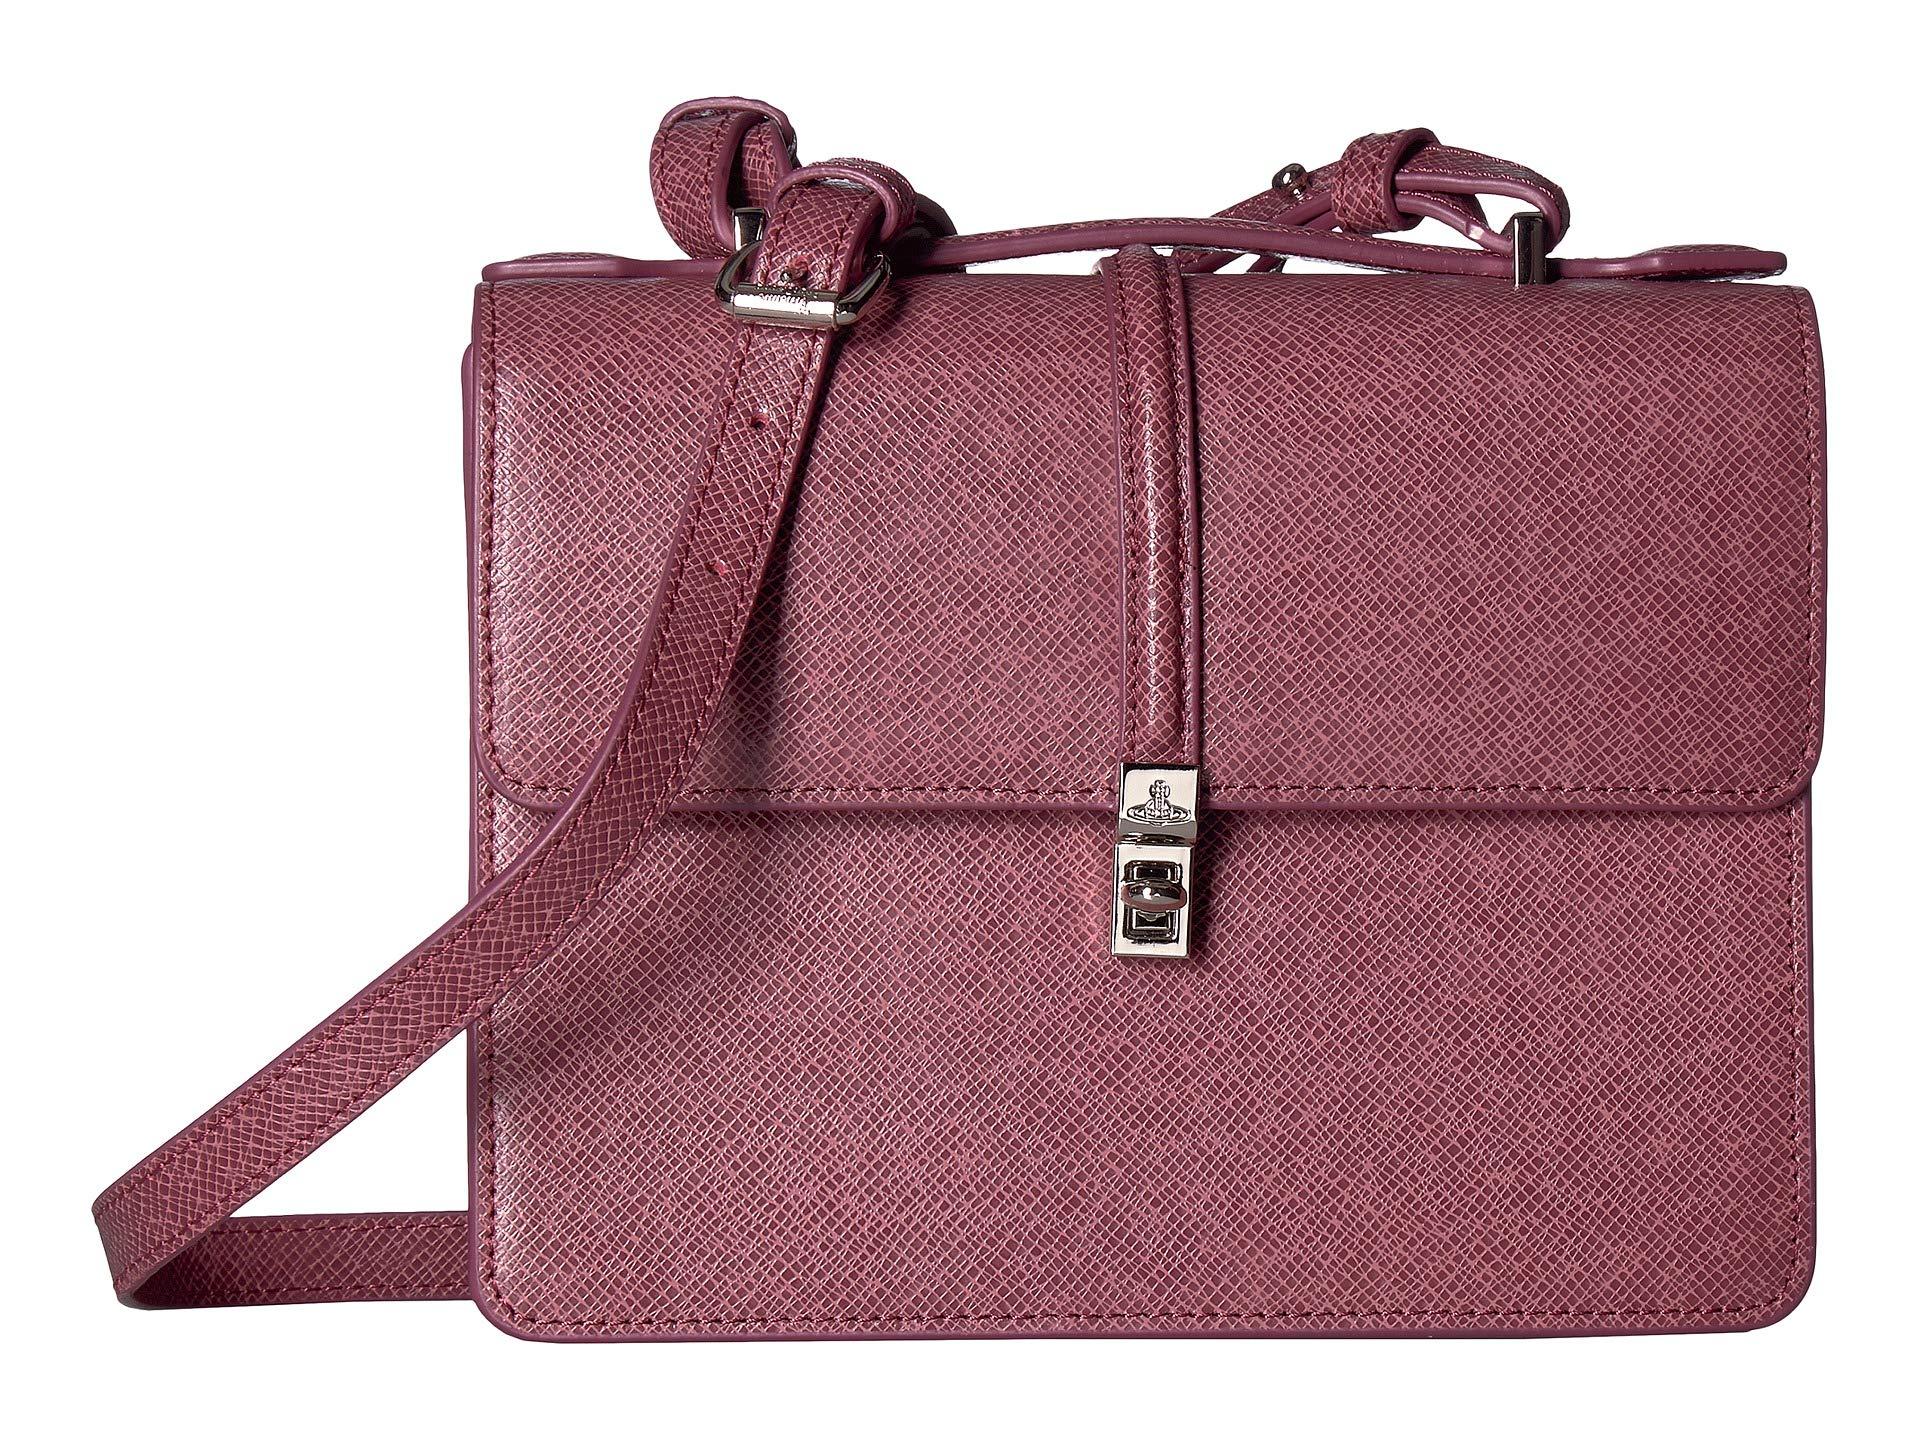 0801d6f446 Vivienne Westwood Sofia Medium Shoulder Bag at Luxury.Zappos.com